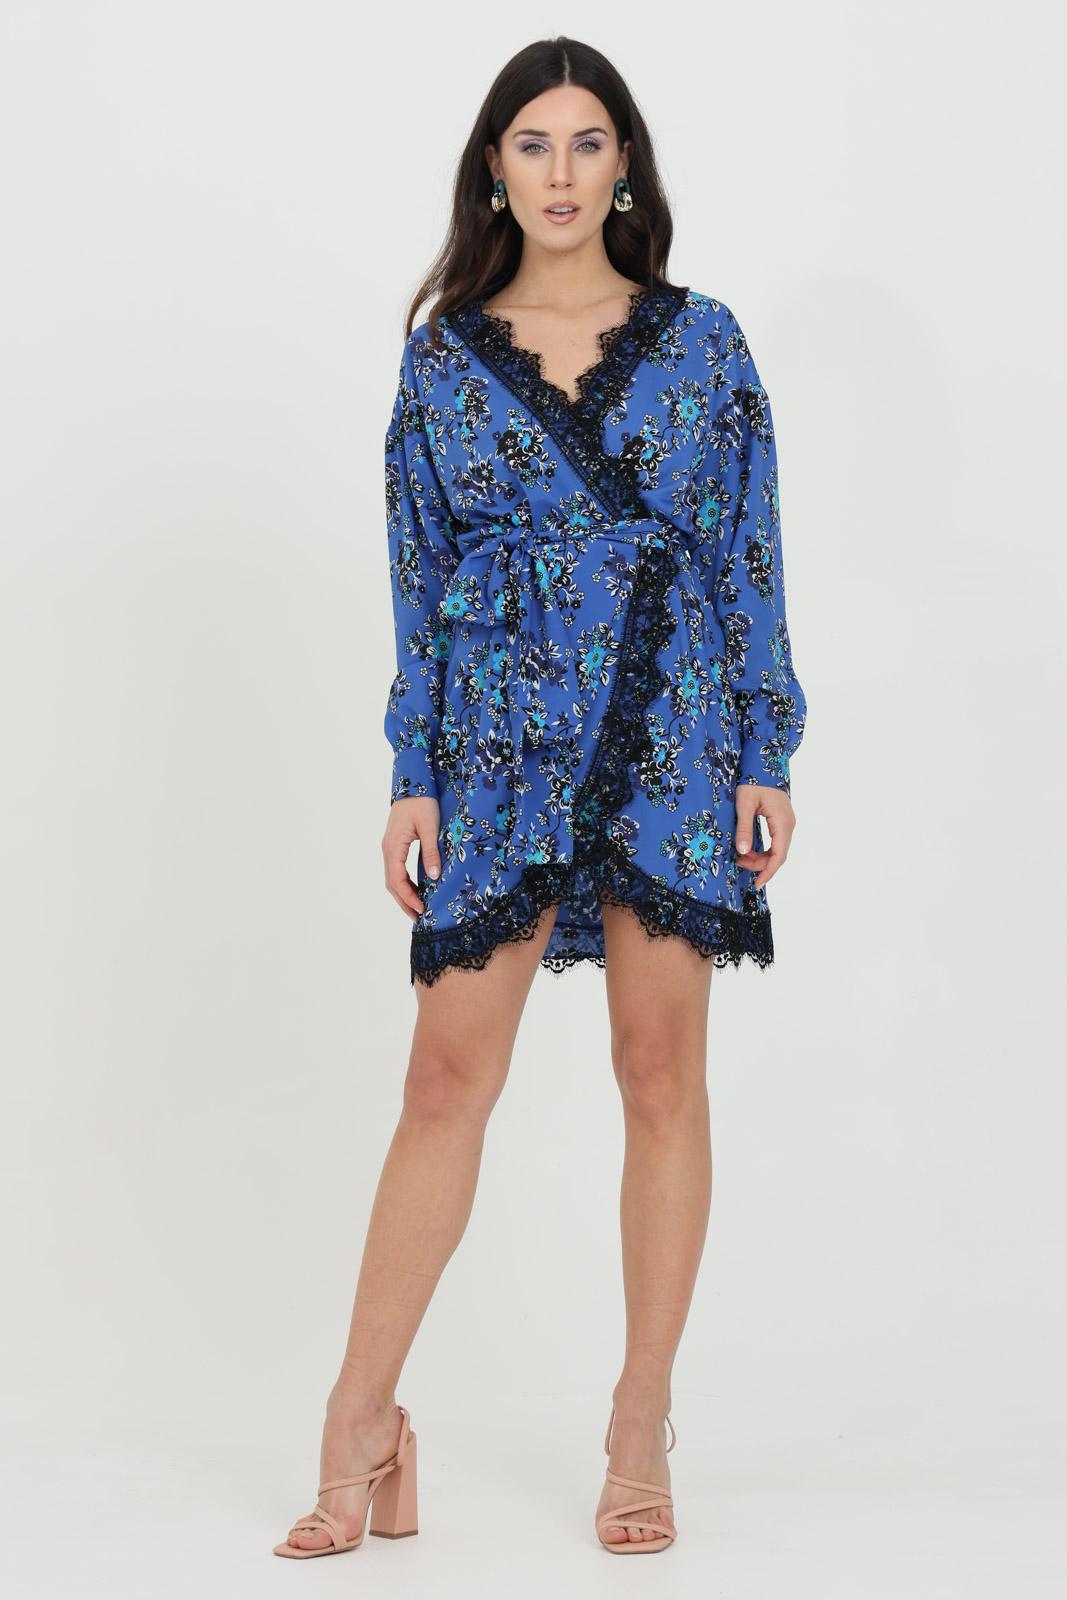 Floral dress with belt, wallet closure PINKO | Dress | 1G163N-8460ET3